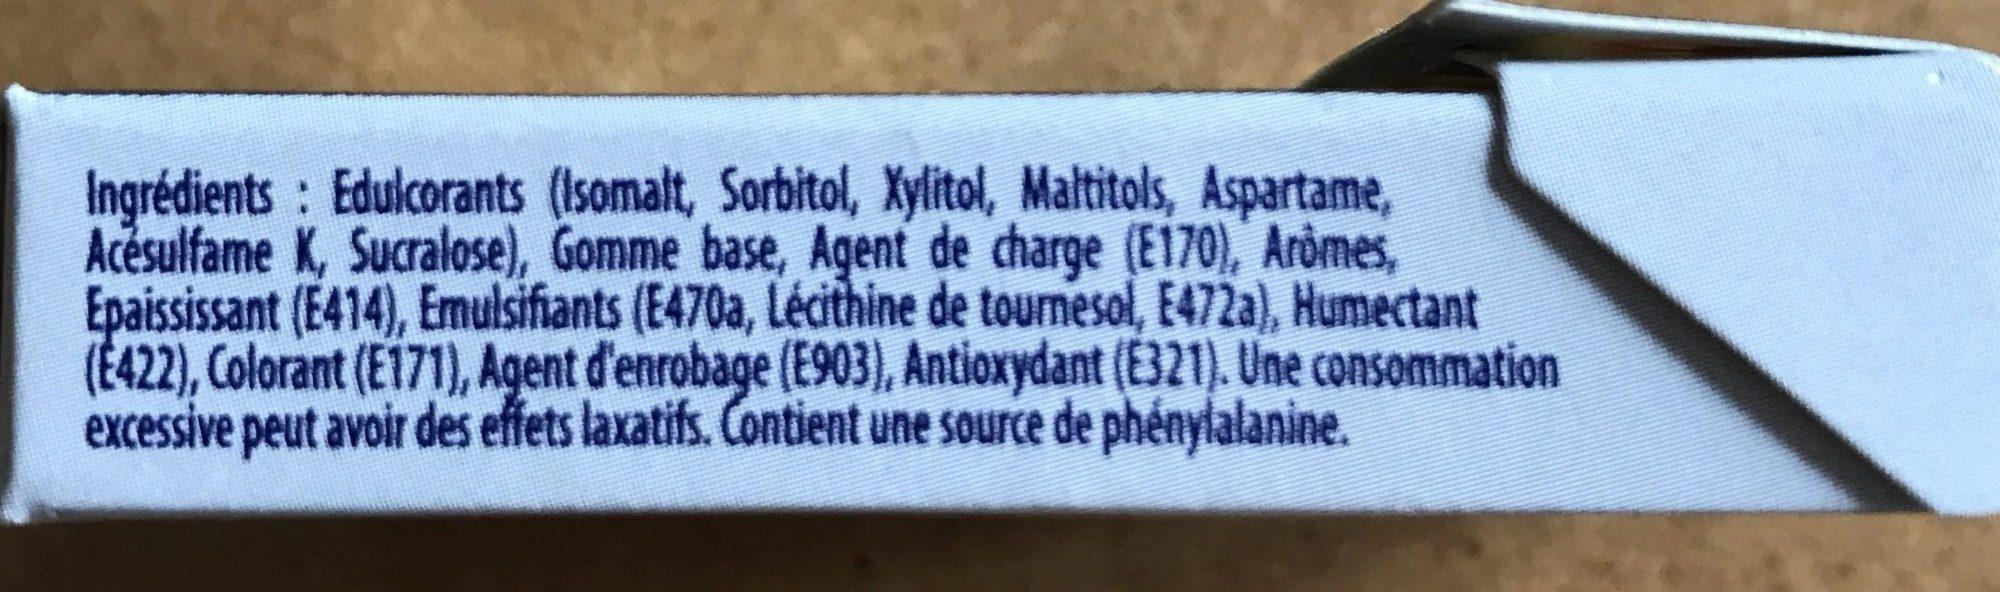 Hollywood Blancheur parfum menthe verte sans sucres - Ingrédients - fr